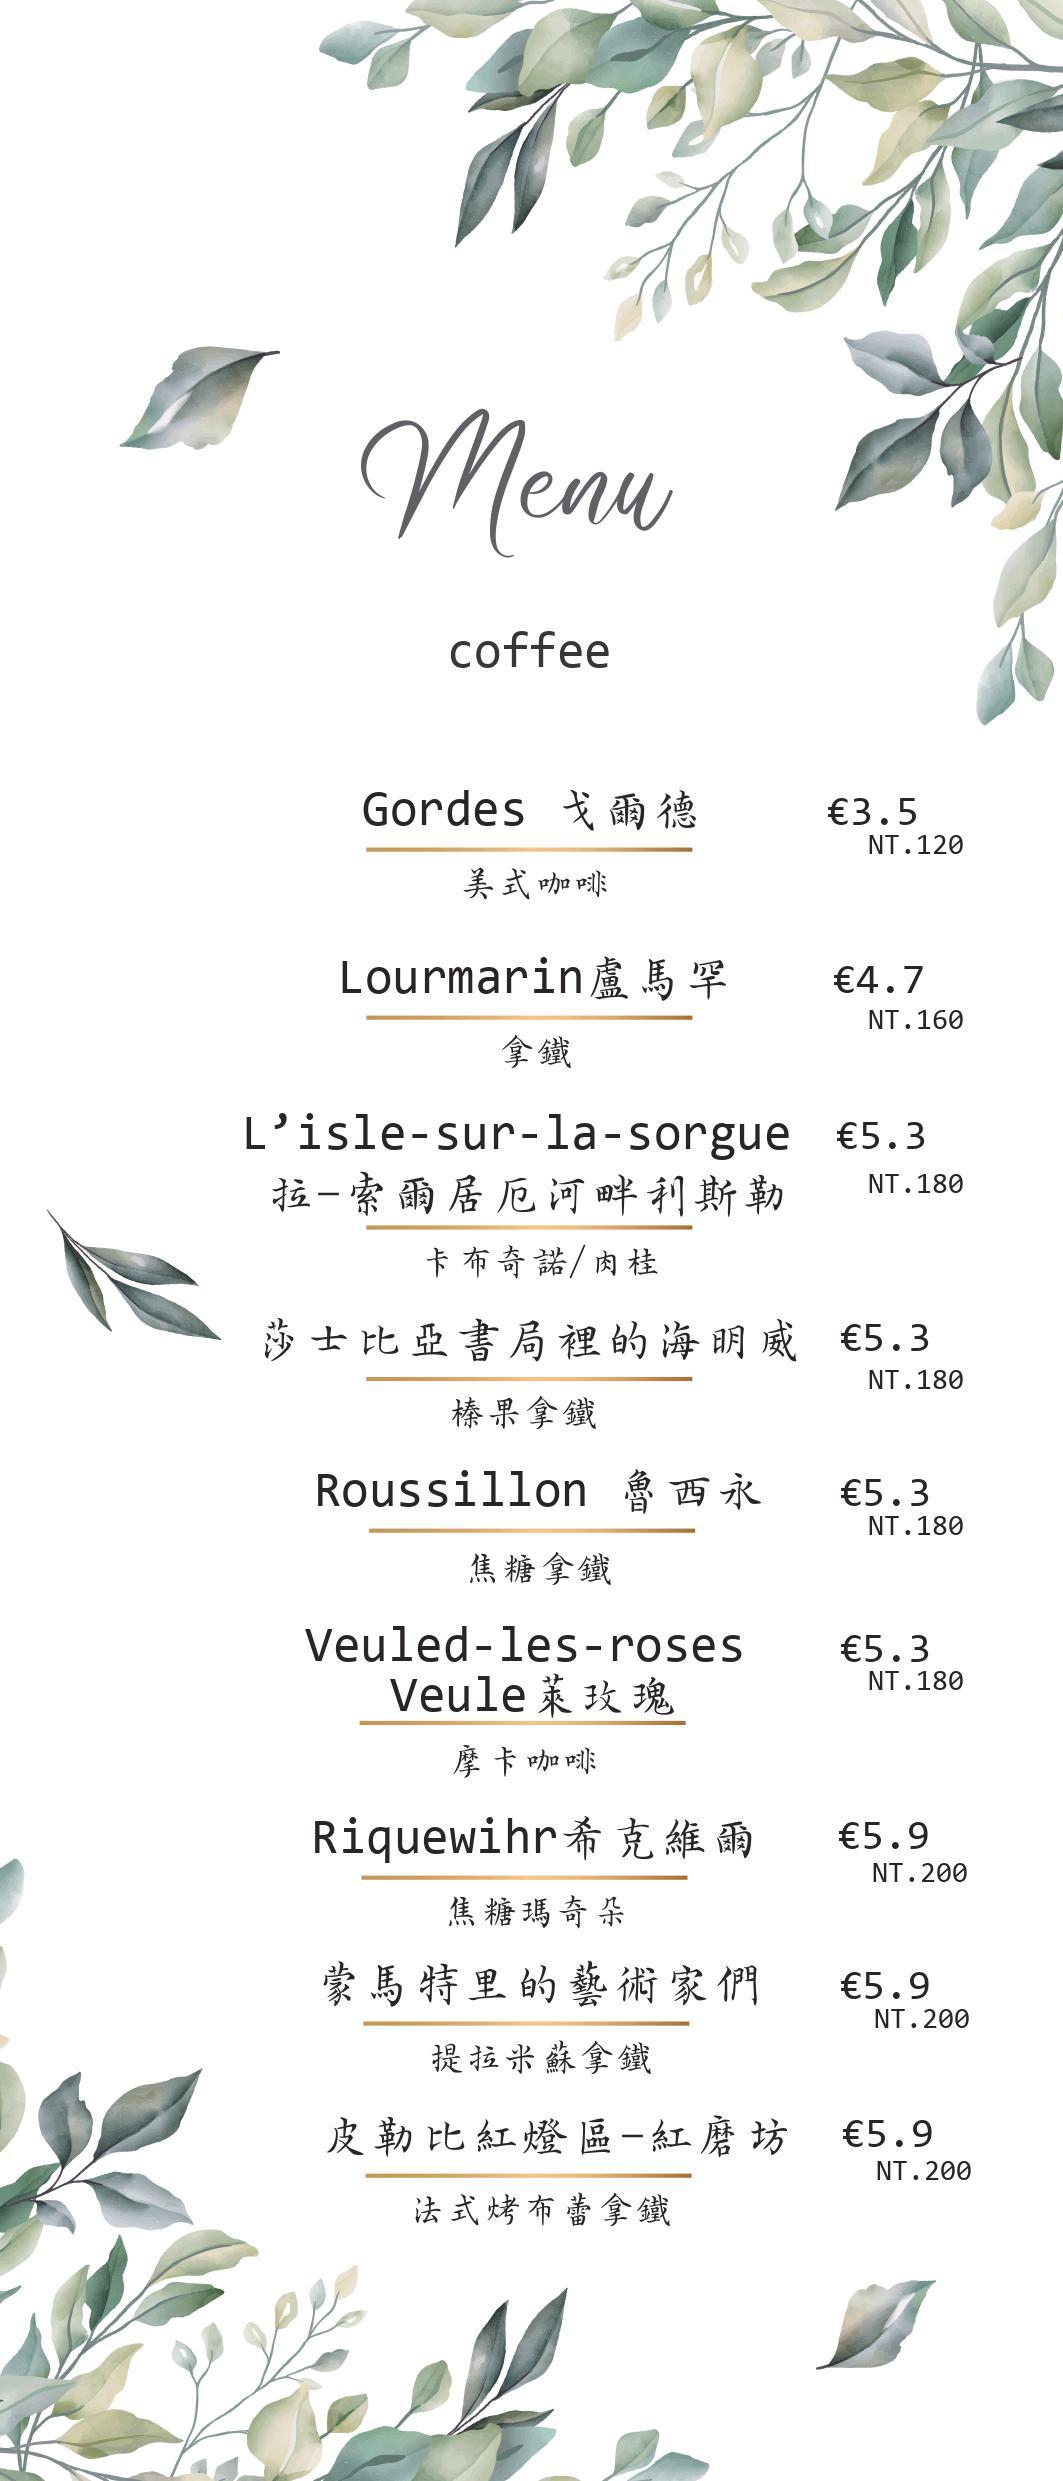 Amour373cafe 阿沐373,平鎮美食,沙灘咖啡館,阿沐菜單 @民宿女王芽月-美食.旅遊.全台趴趴走